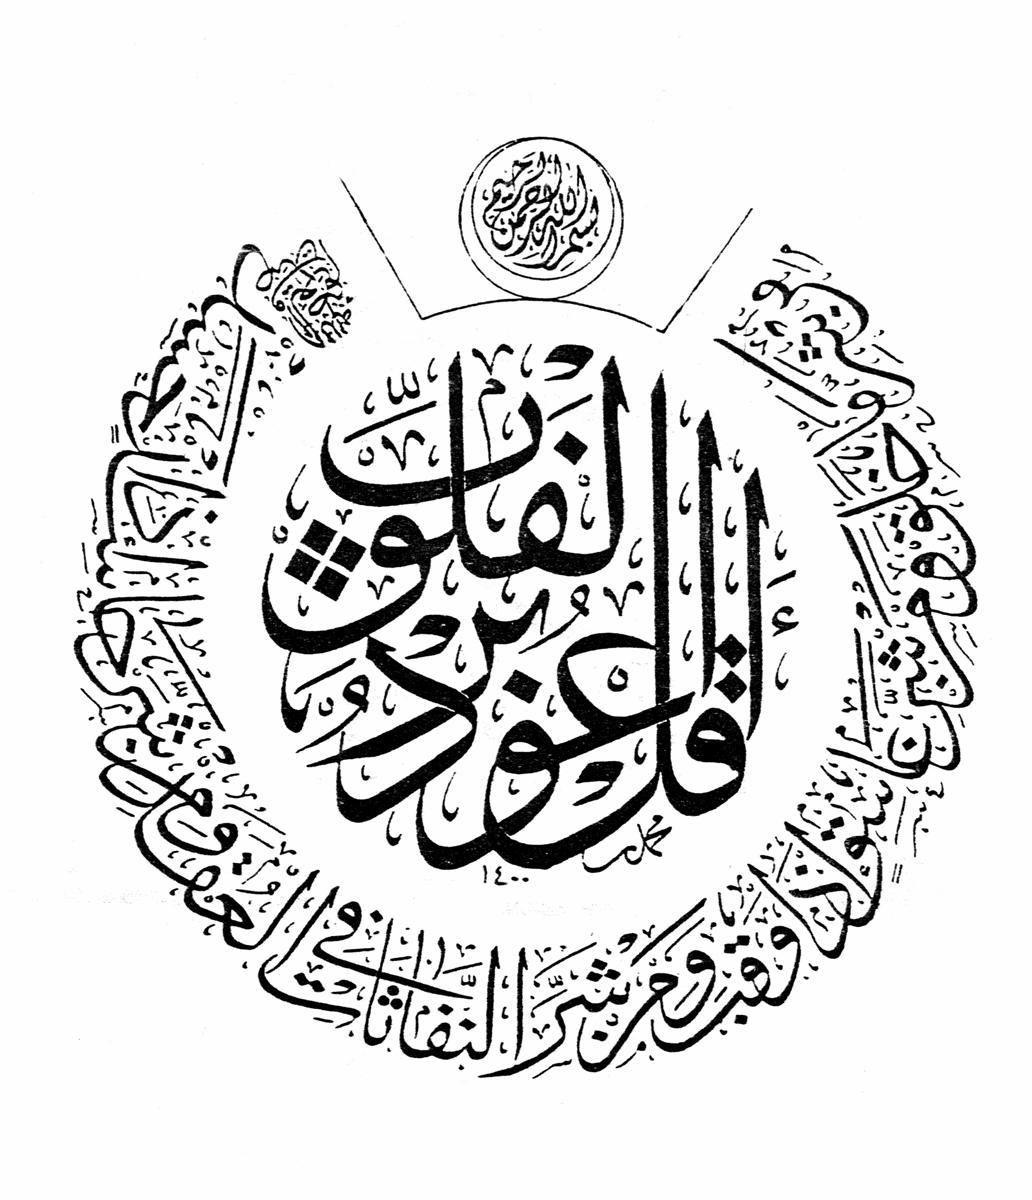 سورة الفلق Arabic Calligraphy Yaqub Studio Y9